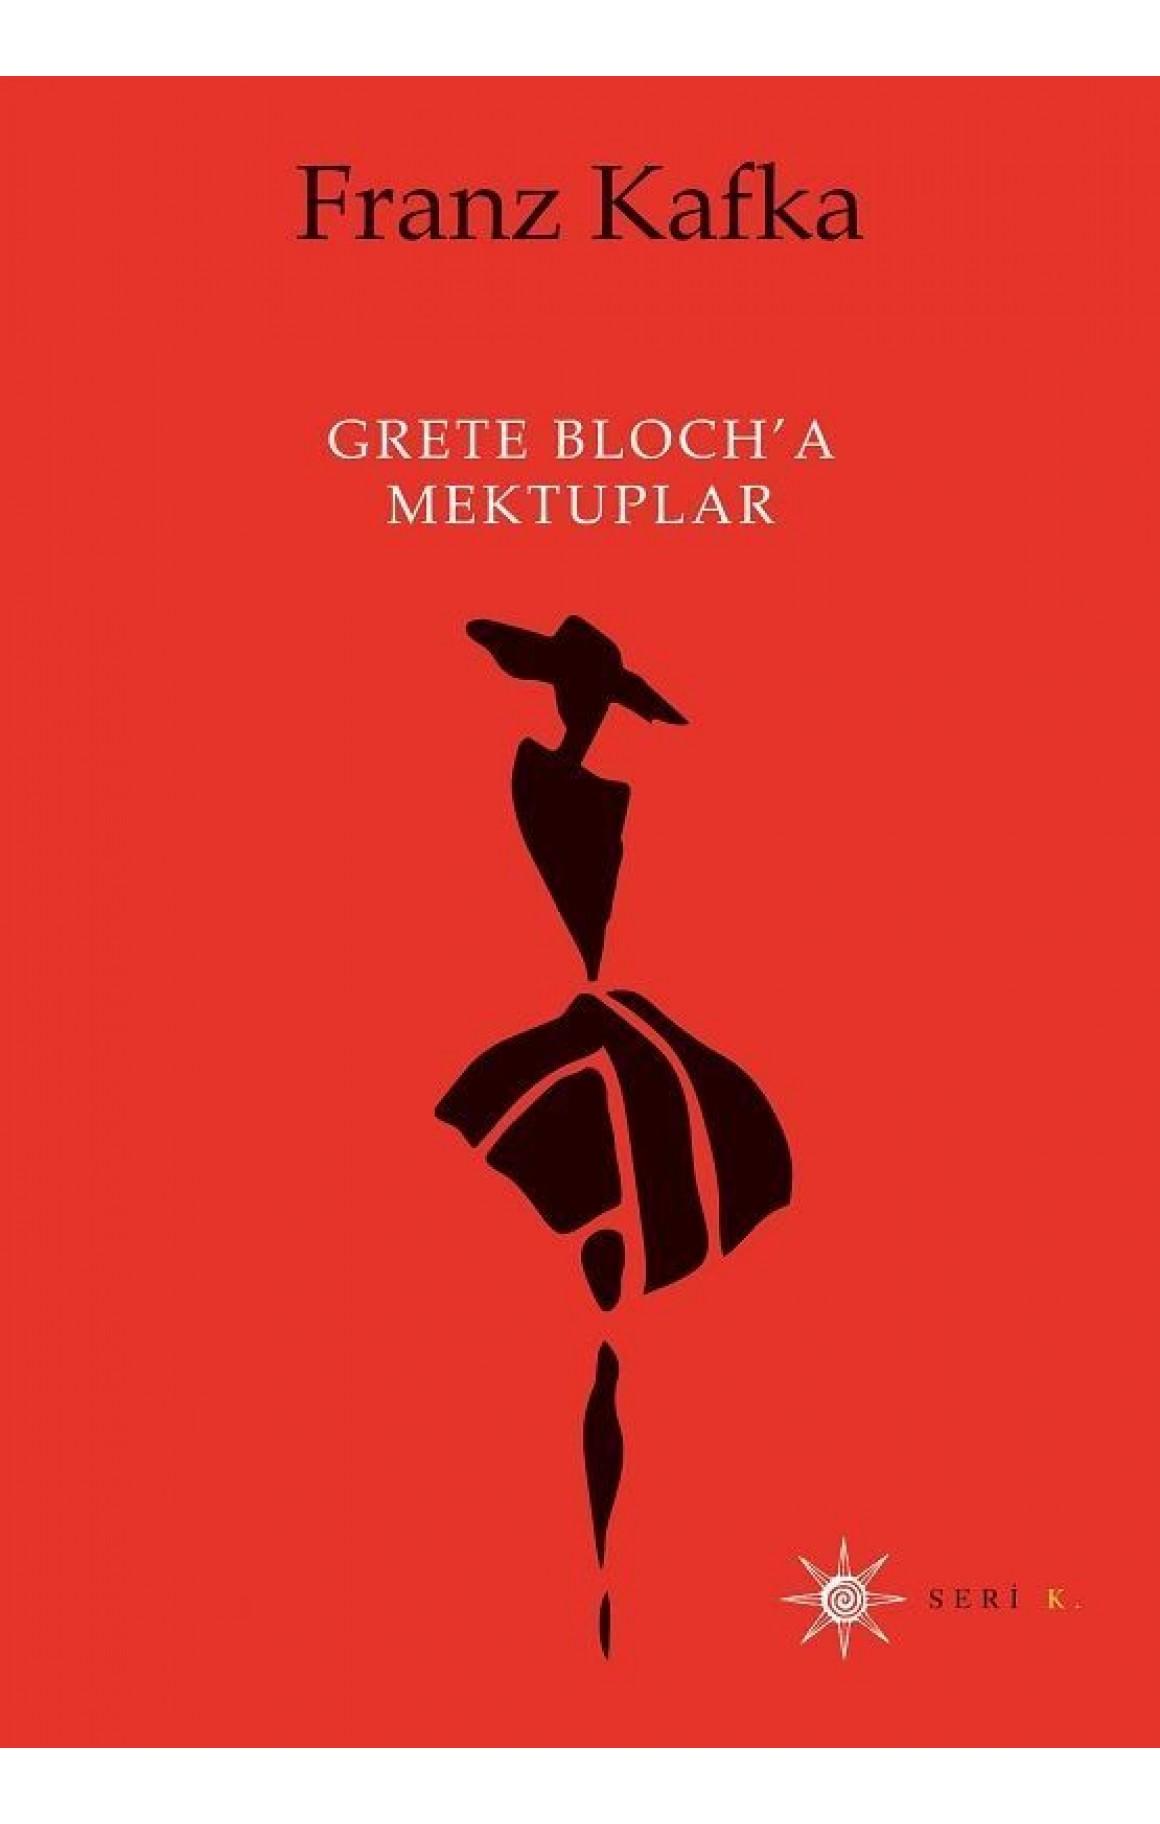 Grete Blocha Mektuplar